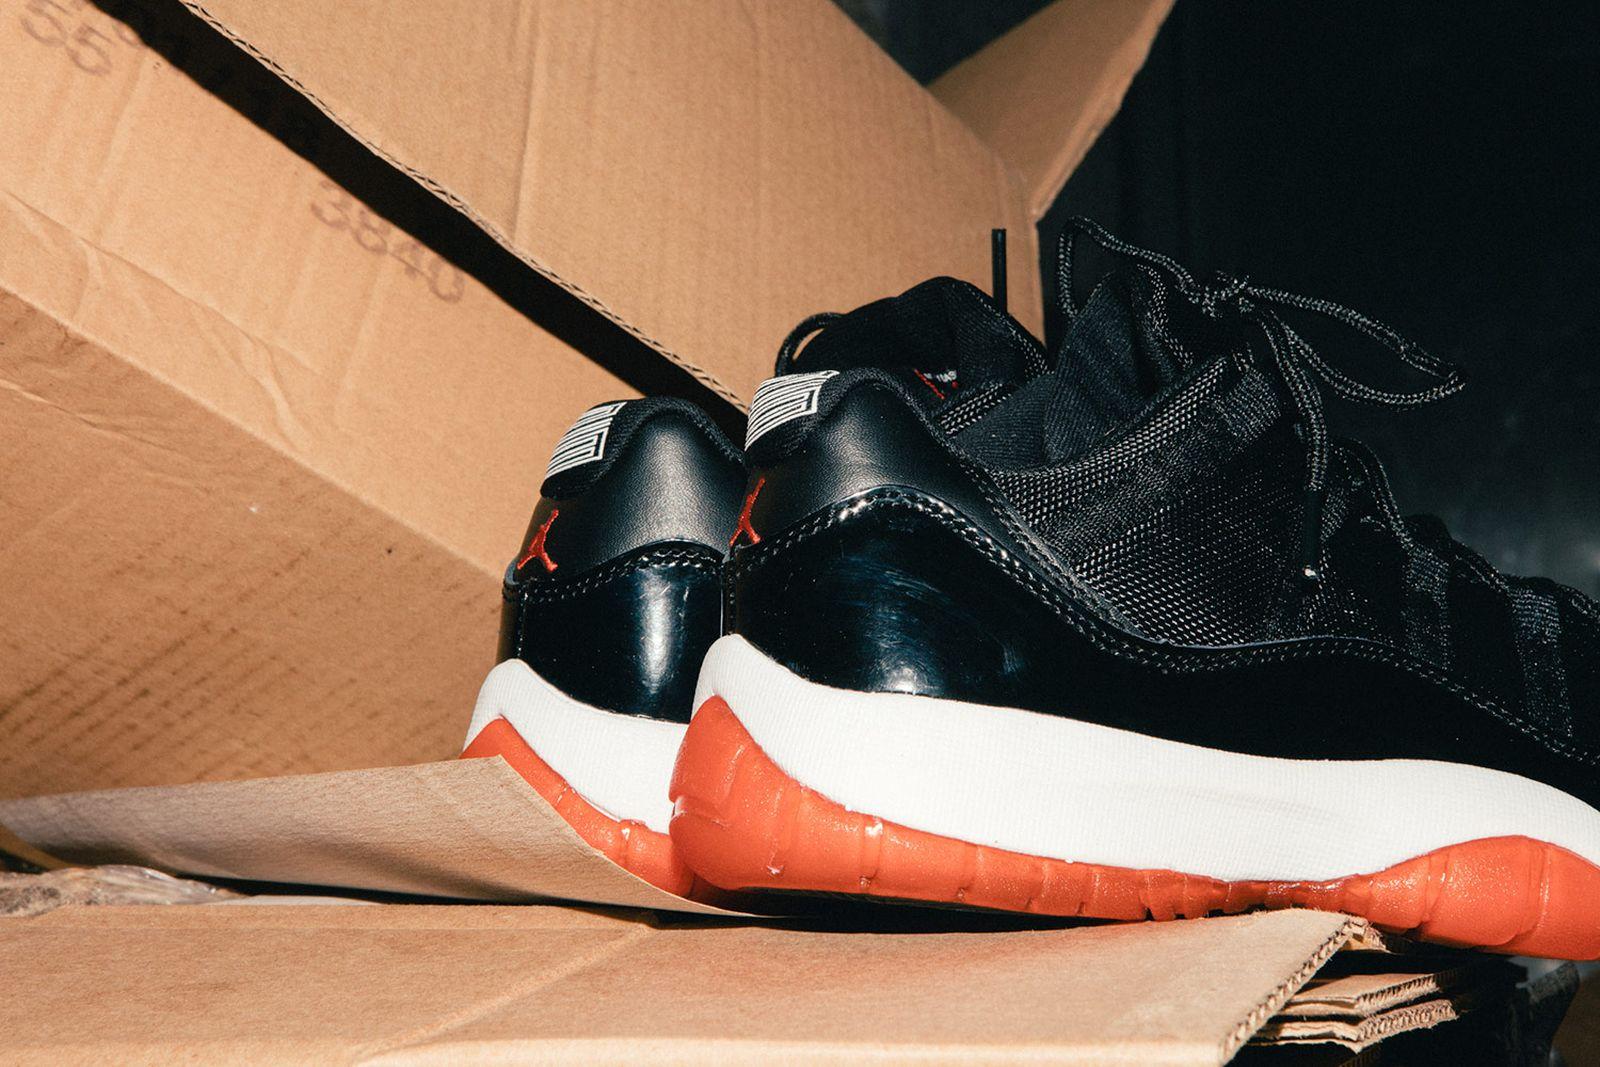 Legit-Check-Fake-Sneakers-Highsnobiety-20